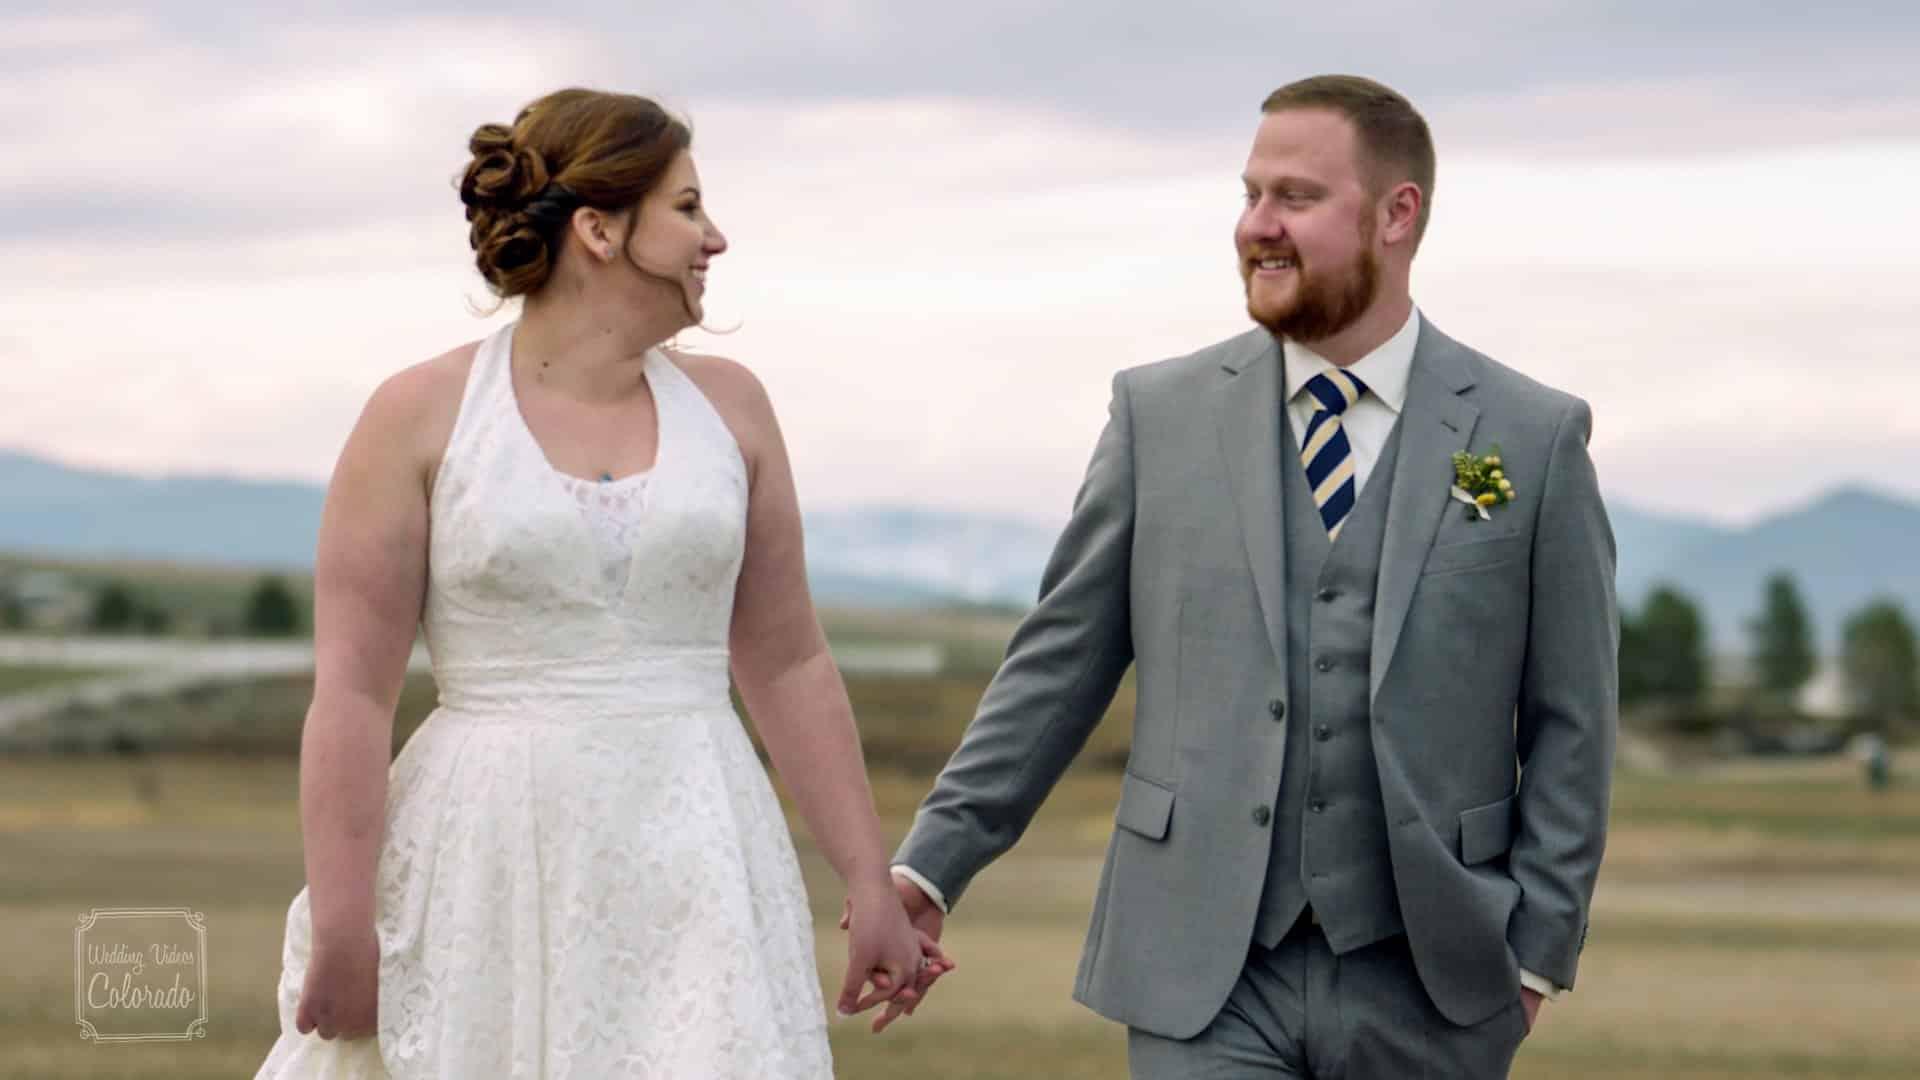 Mathew Rachael intimate wedding video